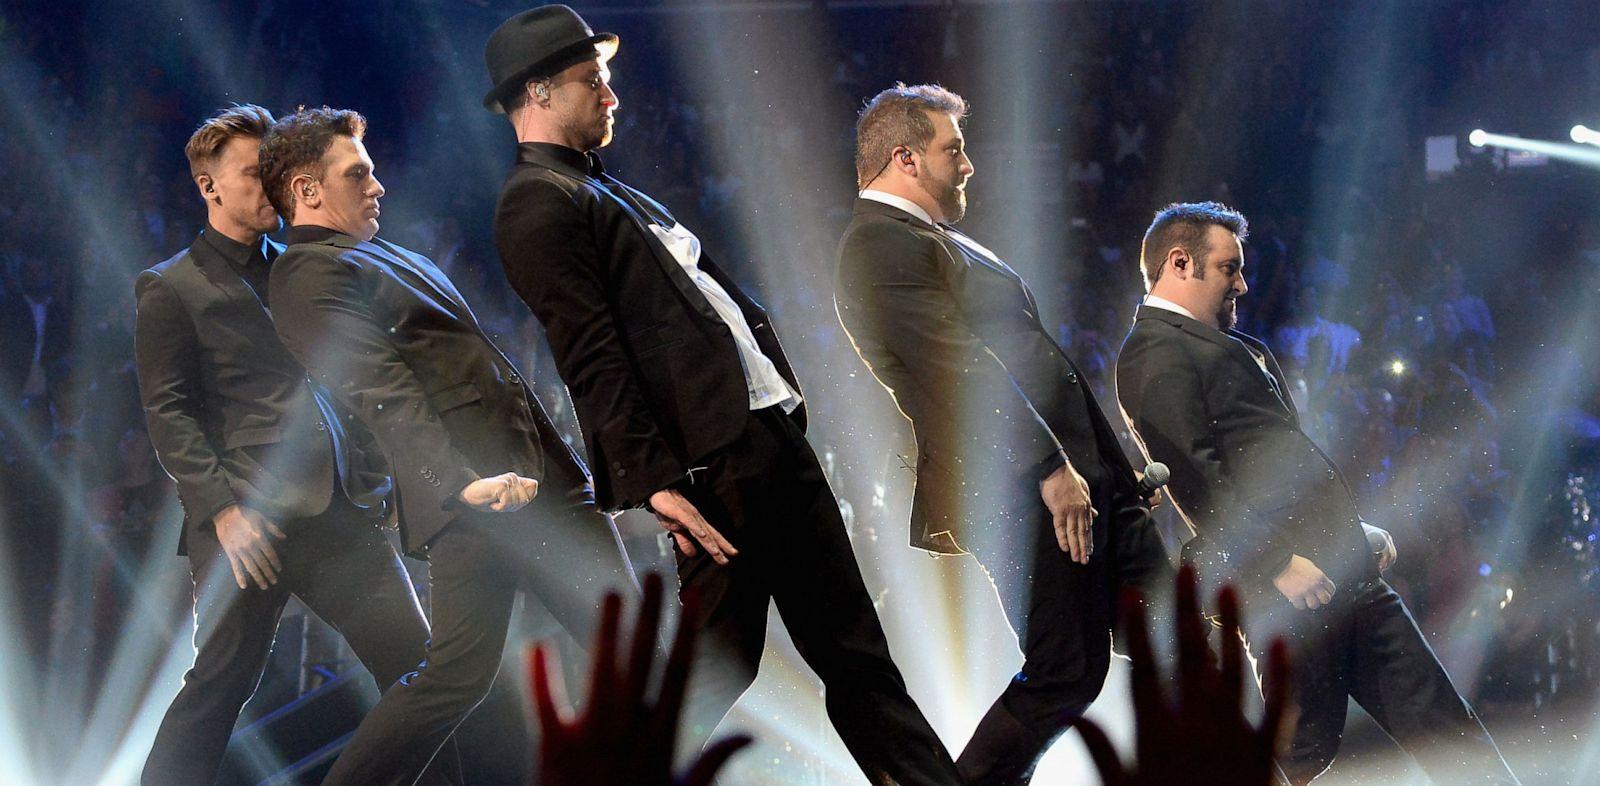 PHOTO: 2013 MTV Video Music Awards